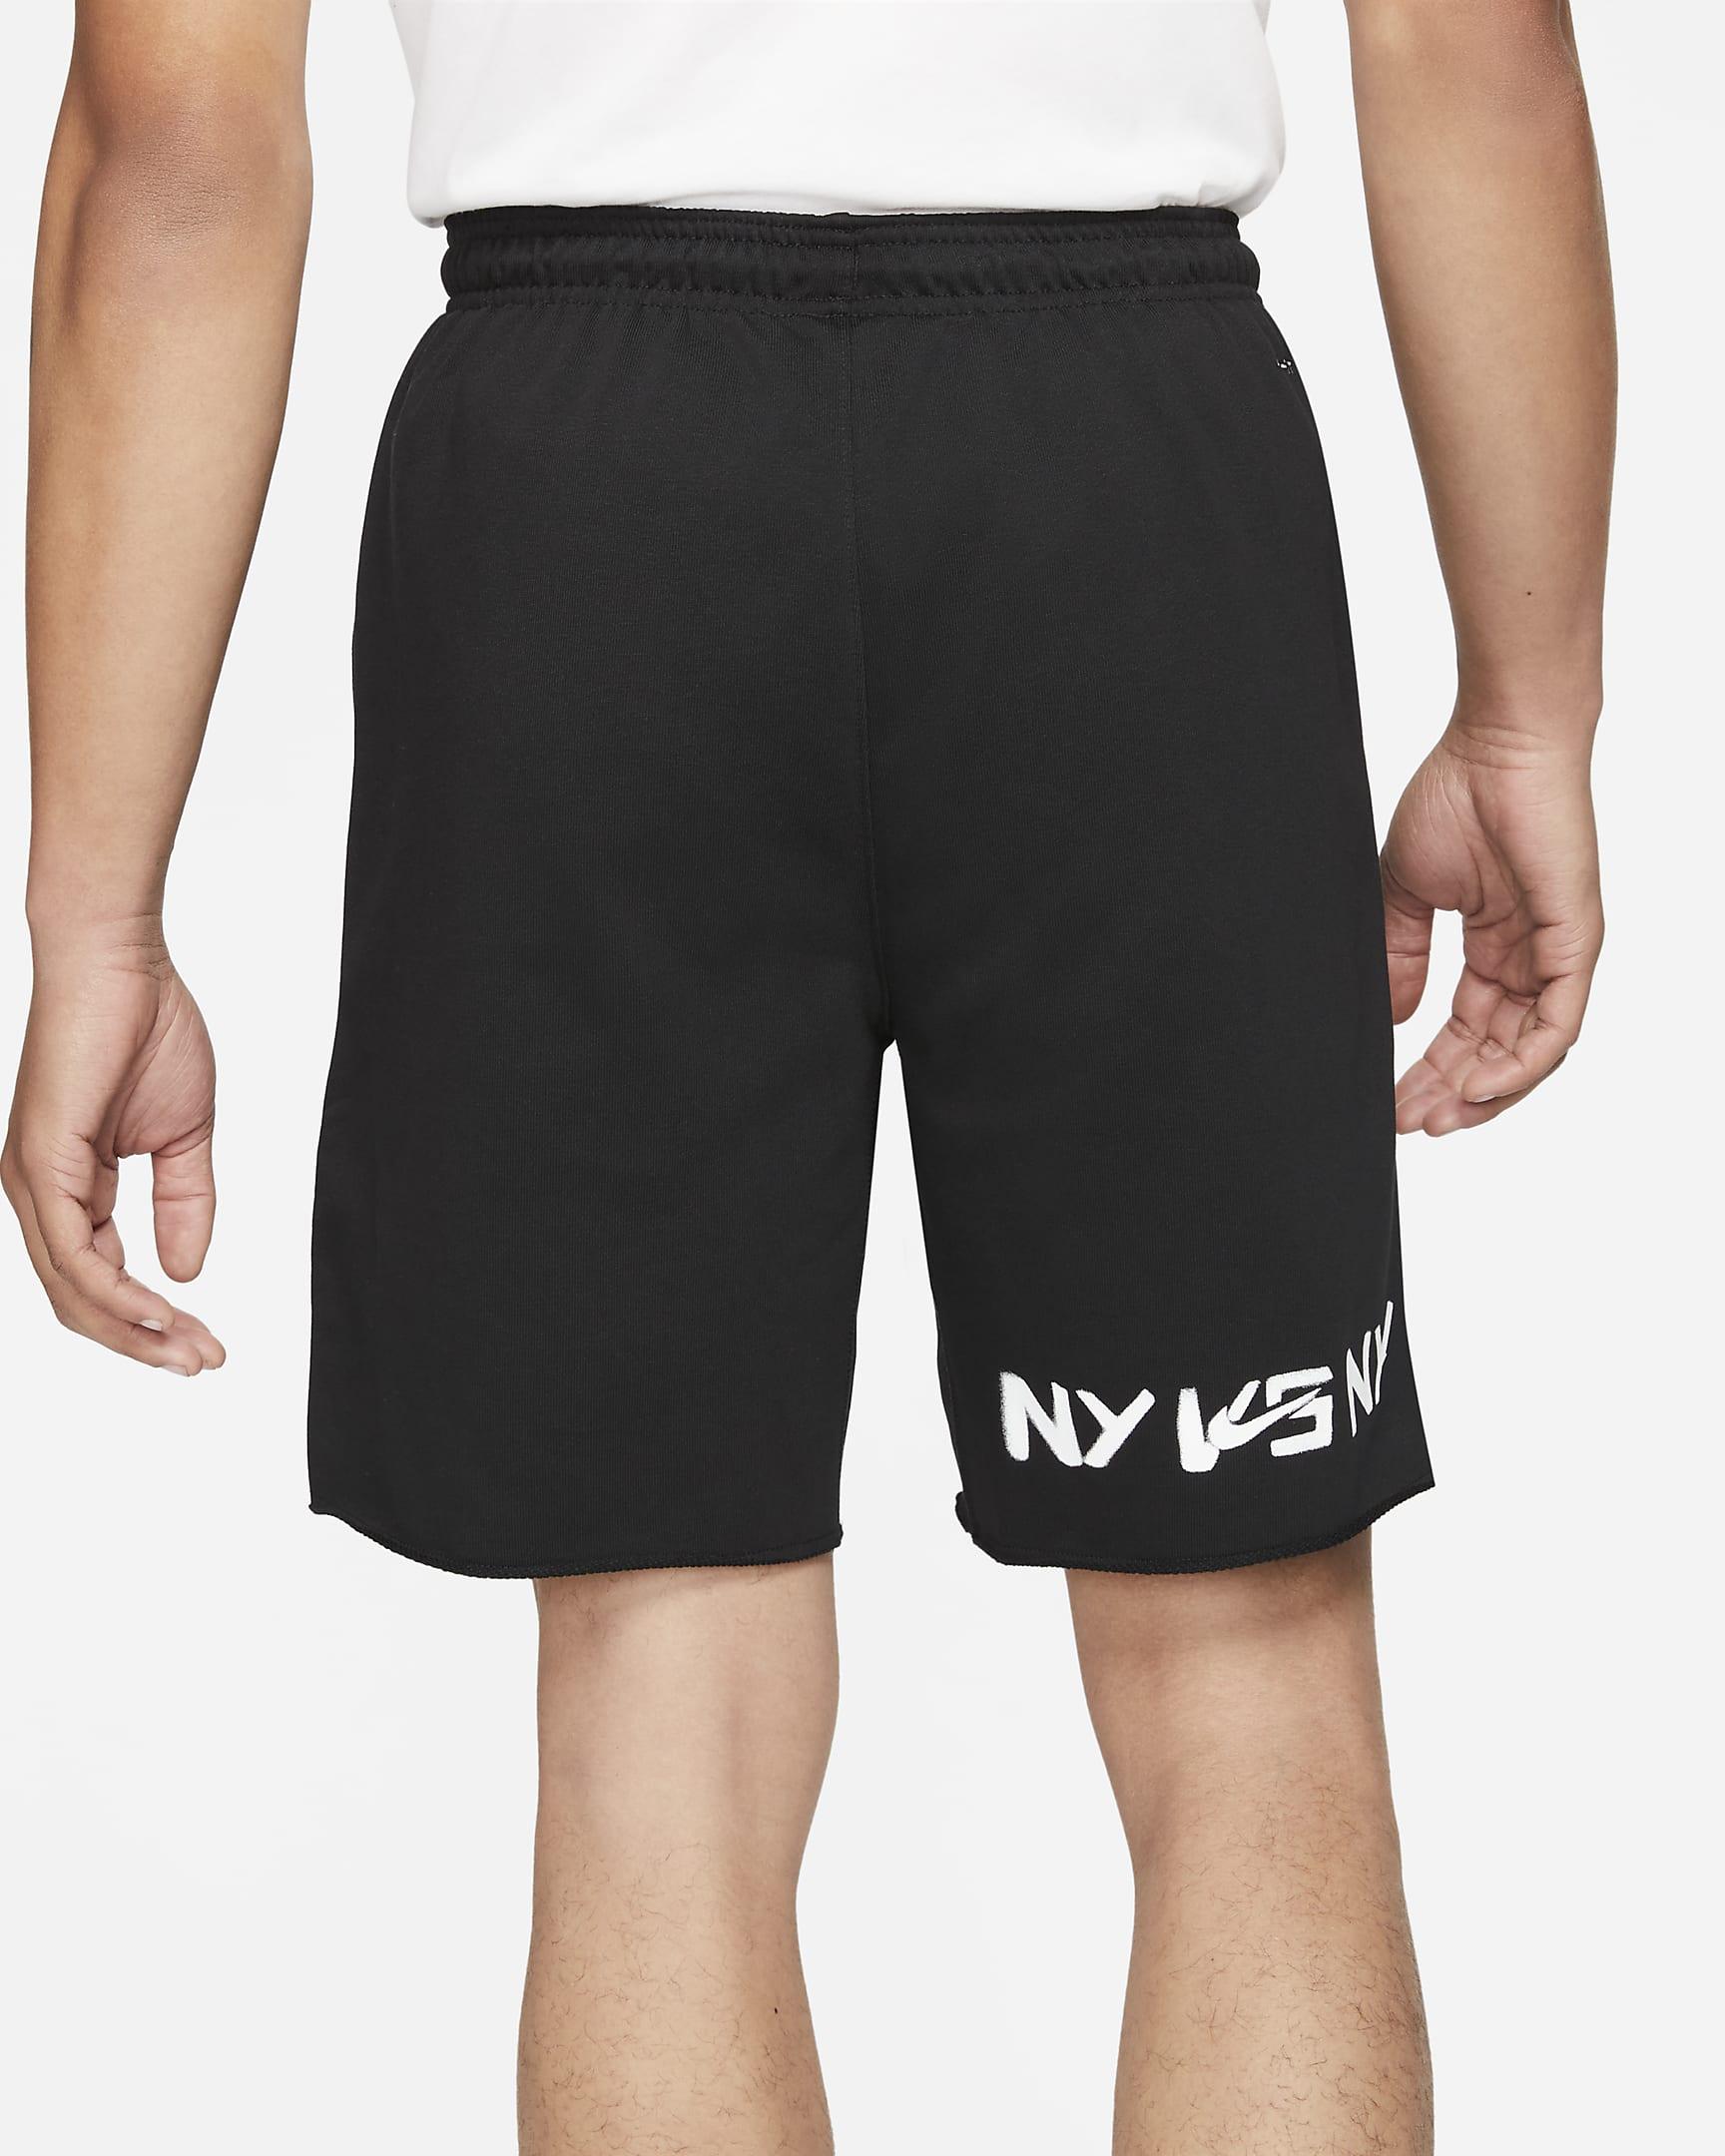 standard-issue-ny-vs-ny-mens-basketball-fleece-shorts-pv03s9-2.png